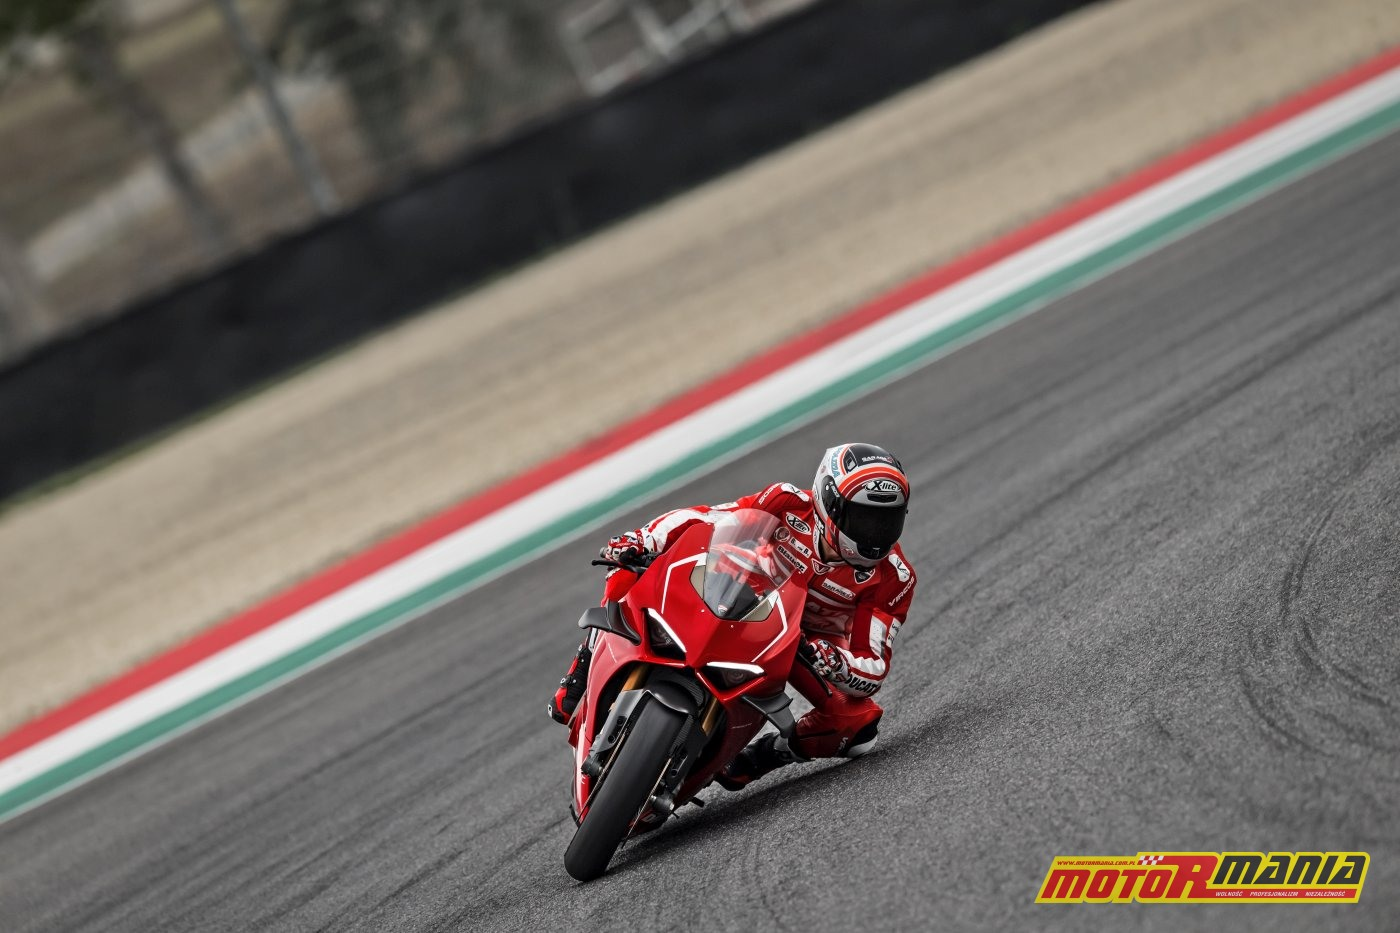 Ducati Panigale V4 R 2019 (35)